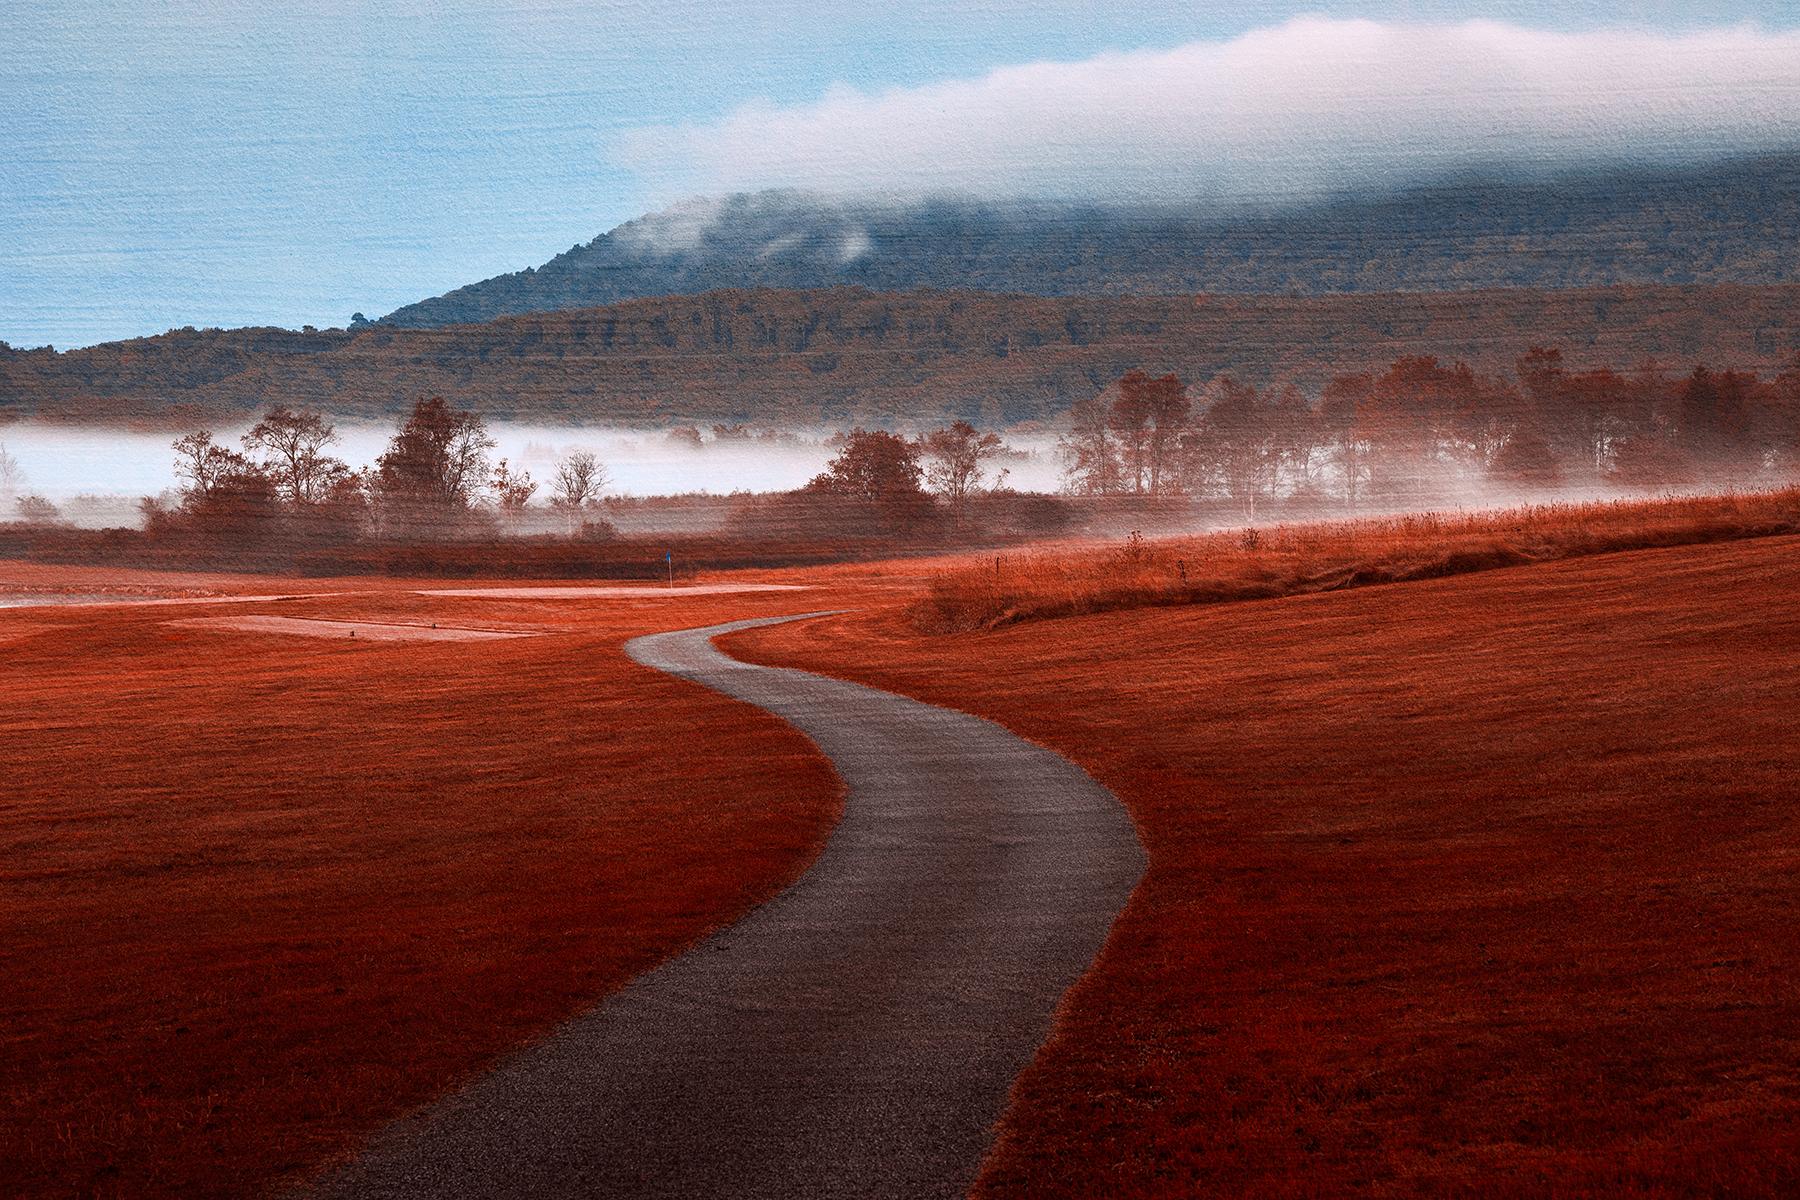 Misty dawn golf course - red carpet fantasy photo